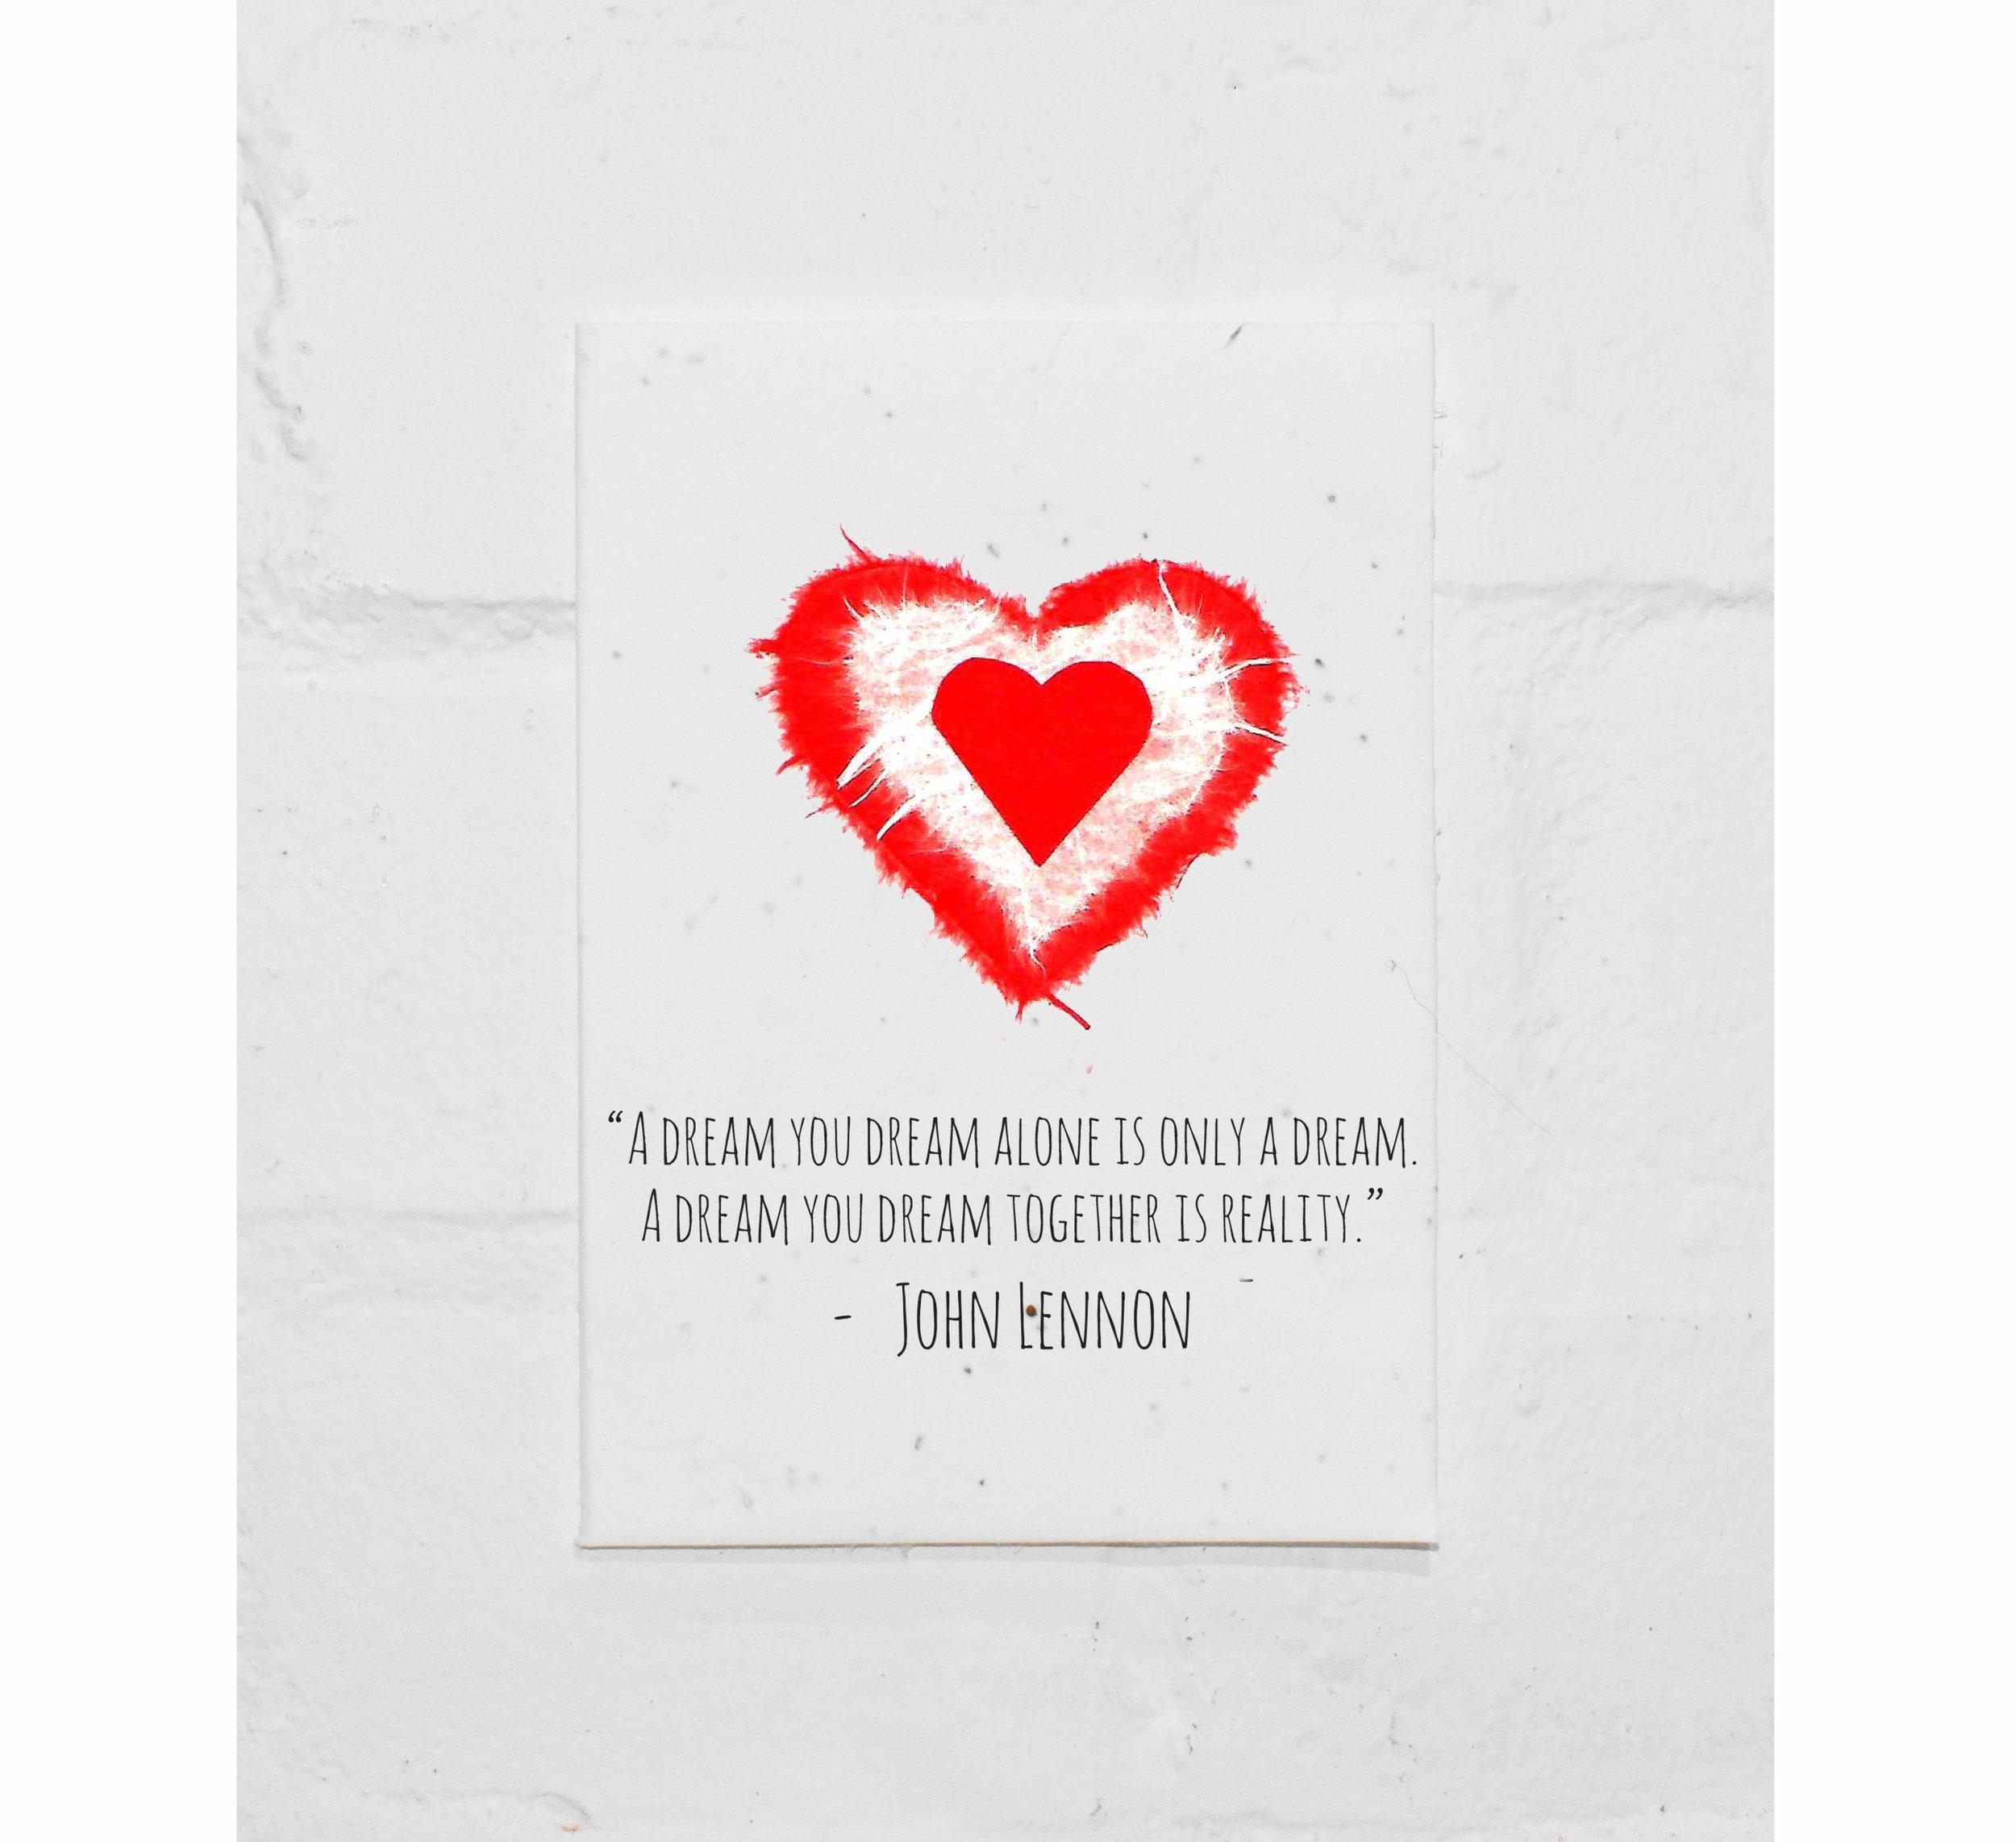 Wedding_card_John_Lennon.jpg